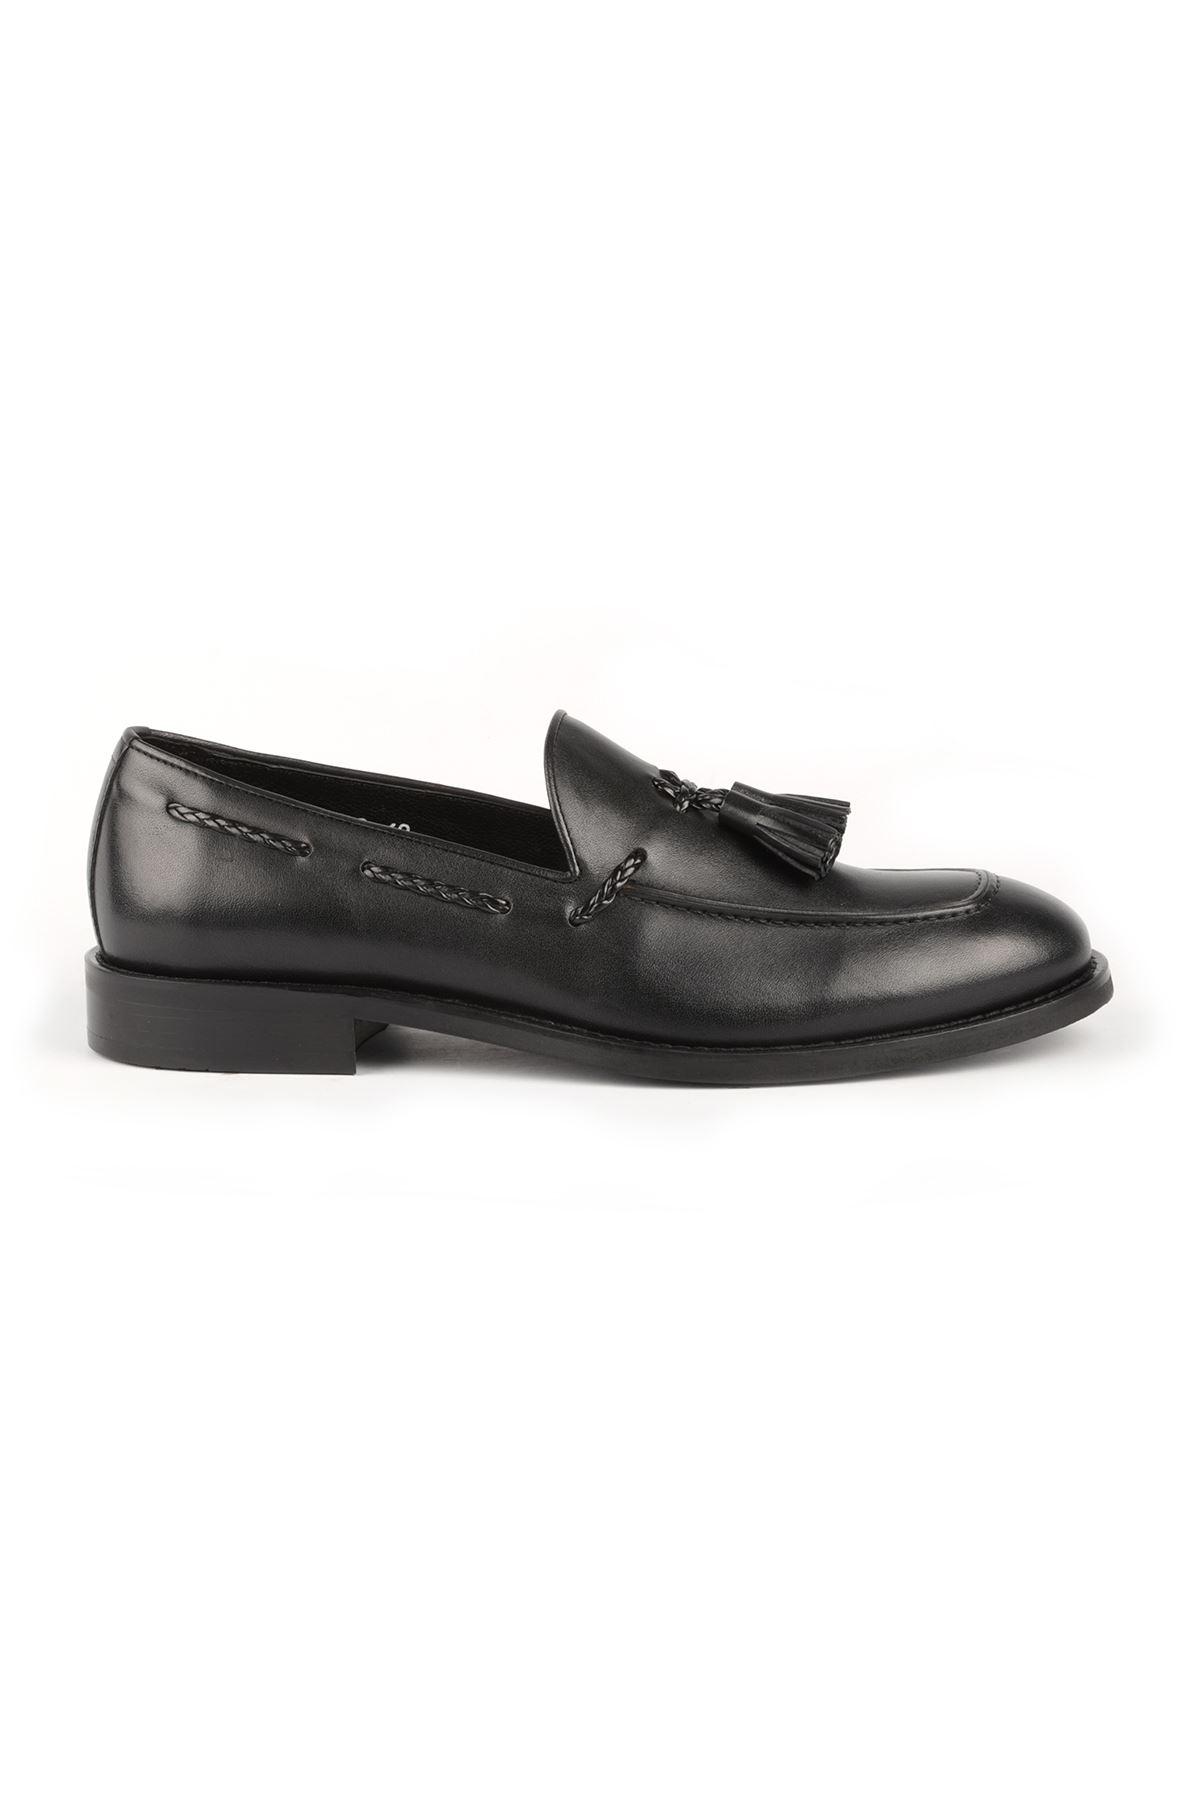 Libero L3562 Black Loafer Casual Shoes